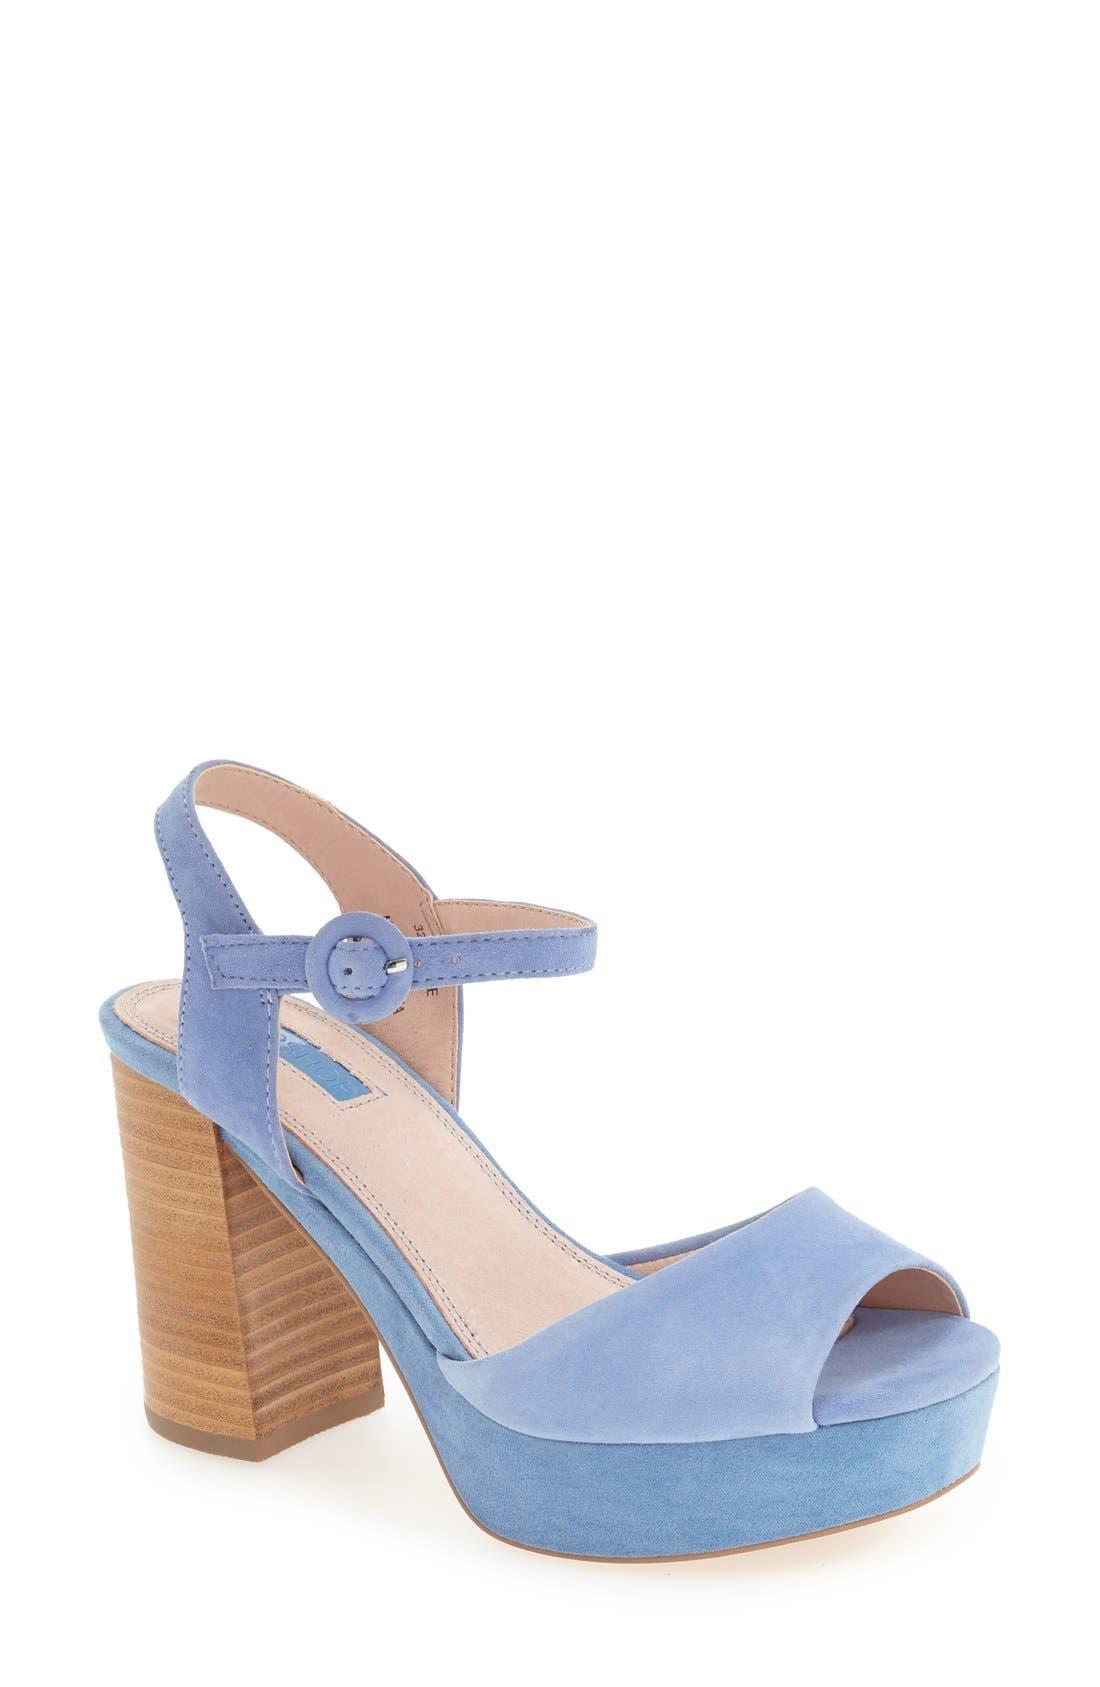 'Lana' Chunky Platform Sandal,                             Main thumbnail 1, color,                             Blue